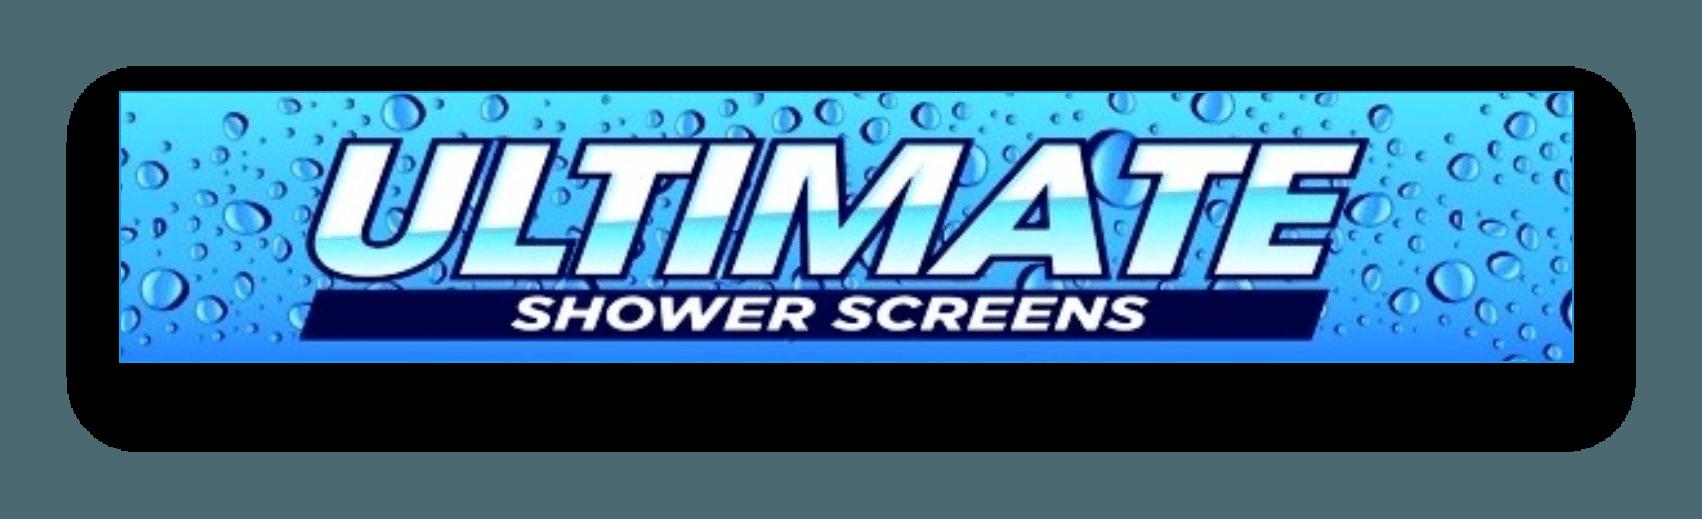 Ultimate Shower Screens